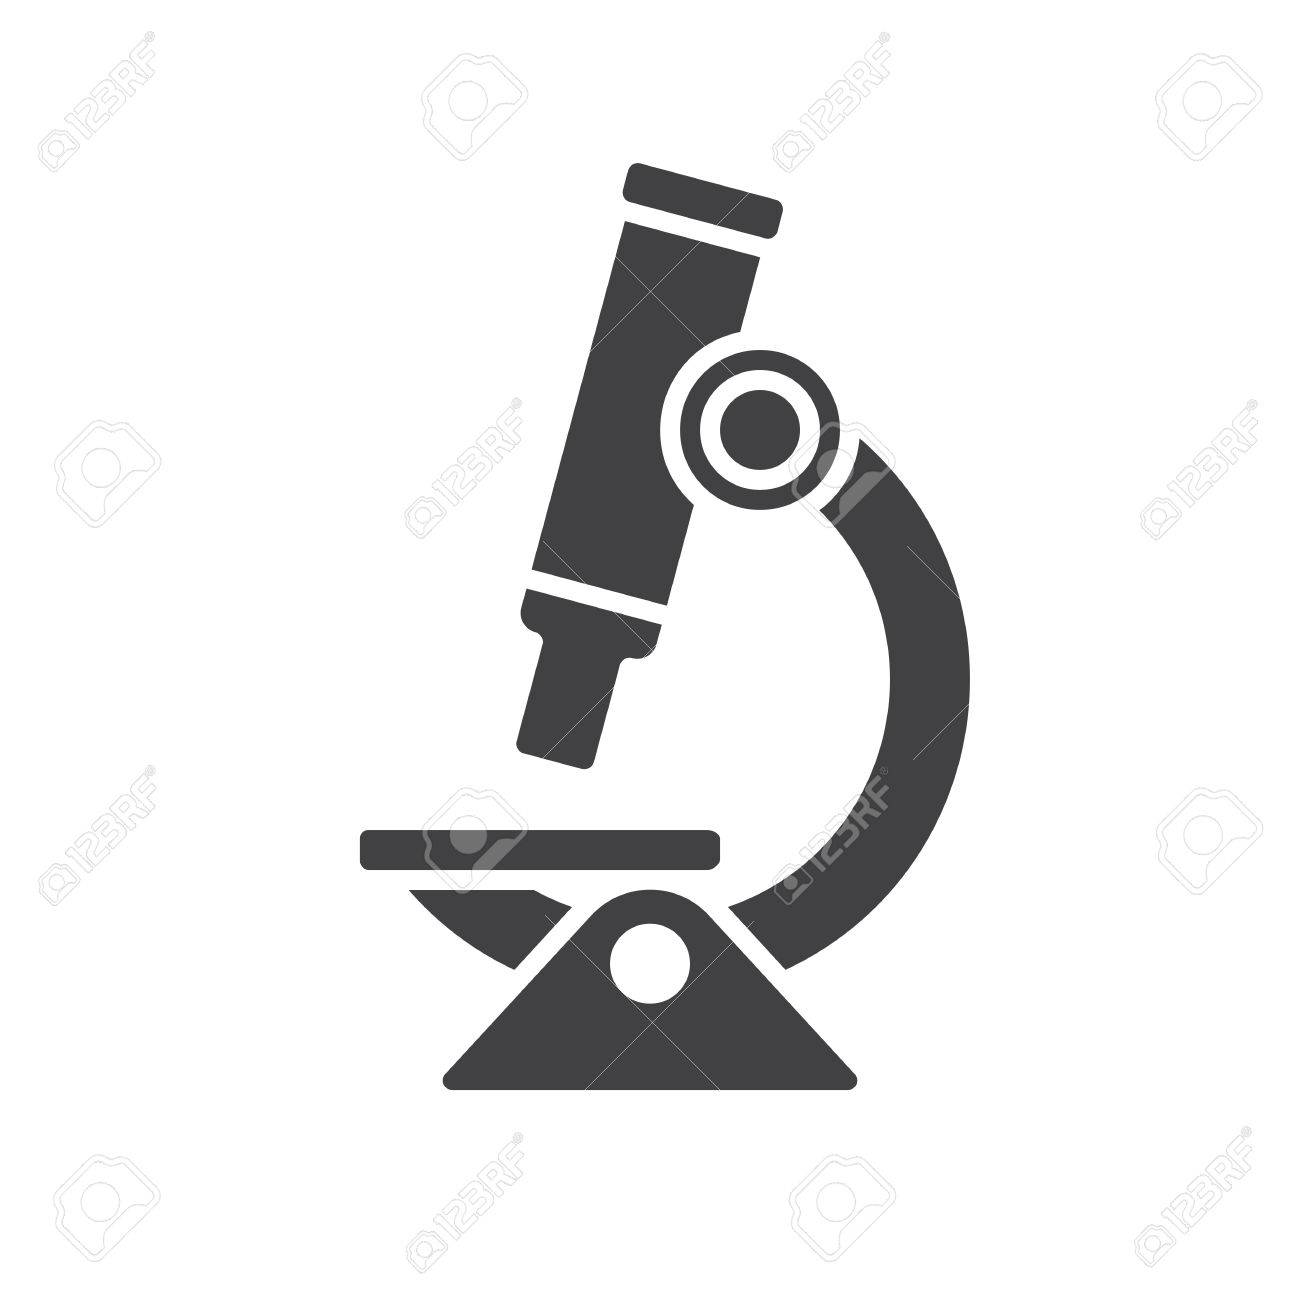 Microscope icon, modern flat icon - 35163030